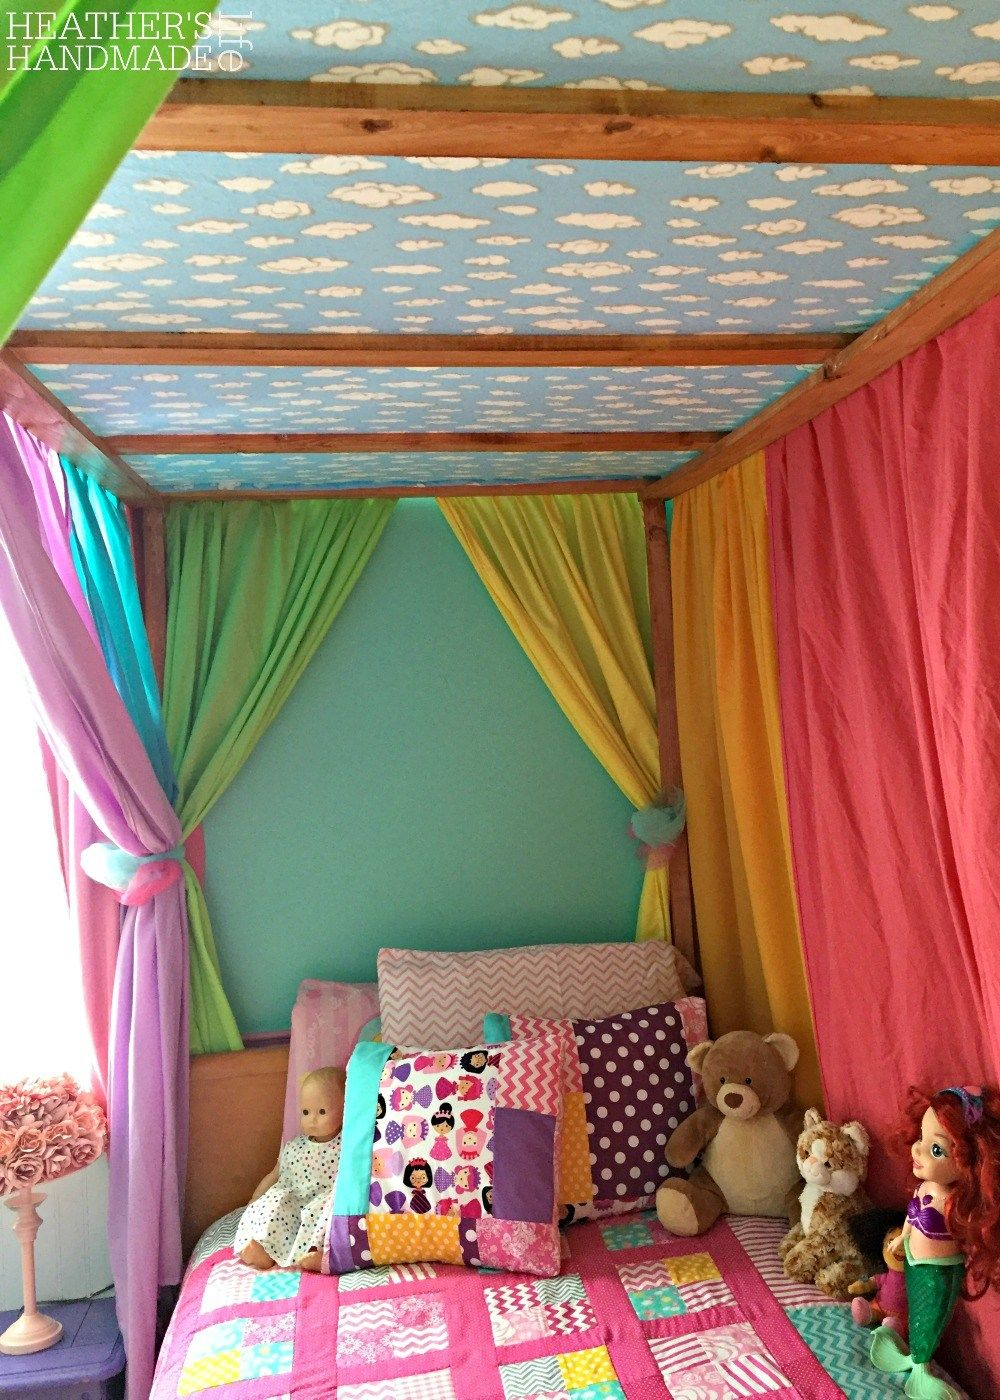 Diy Rainbow Canopy Bed Heather S Handmade Life Canopy Bed Diy Girls Bed Canopy Kids Bed Curtain